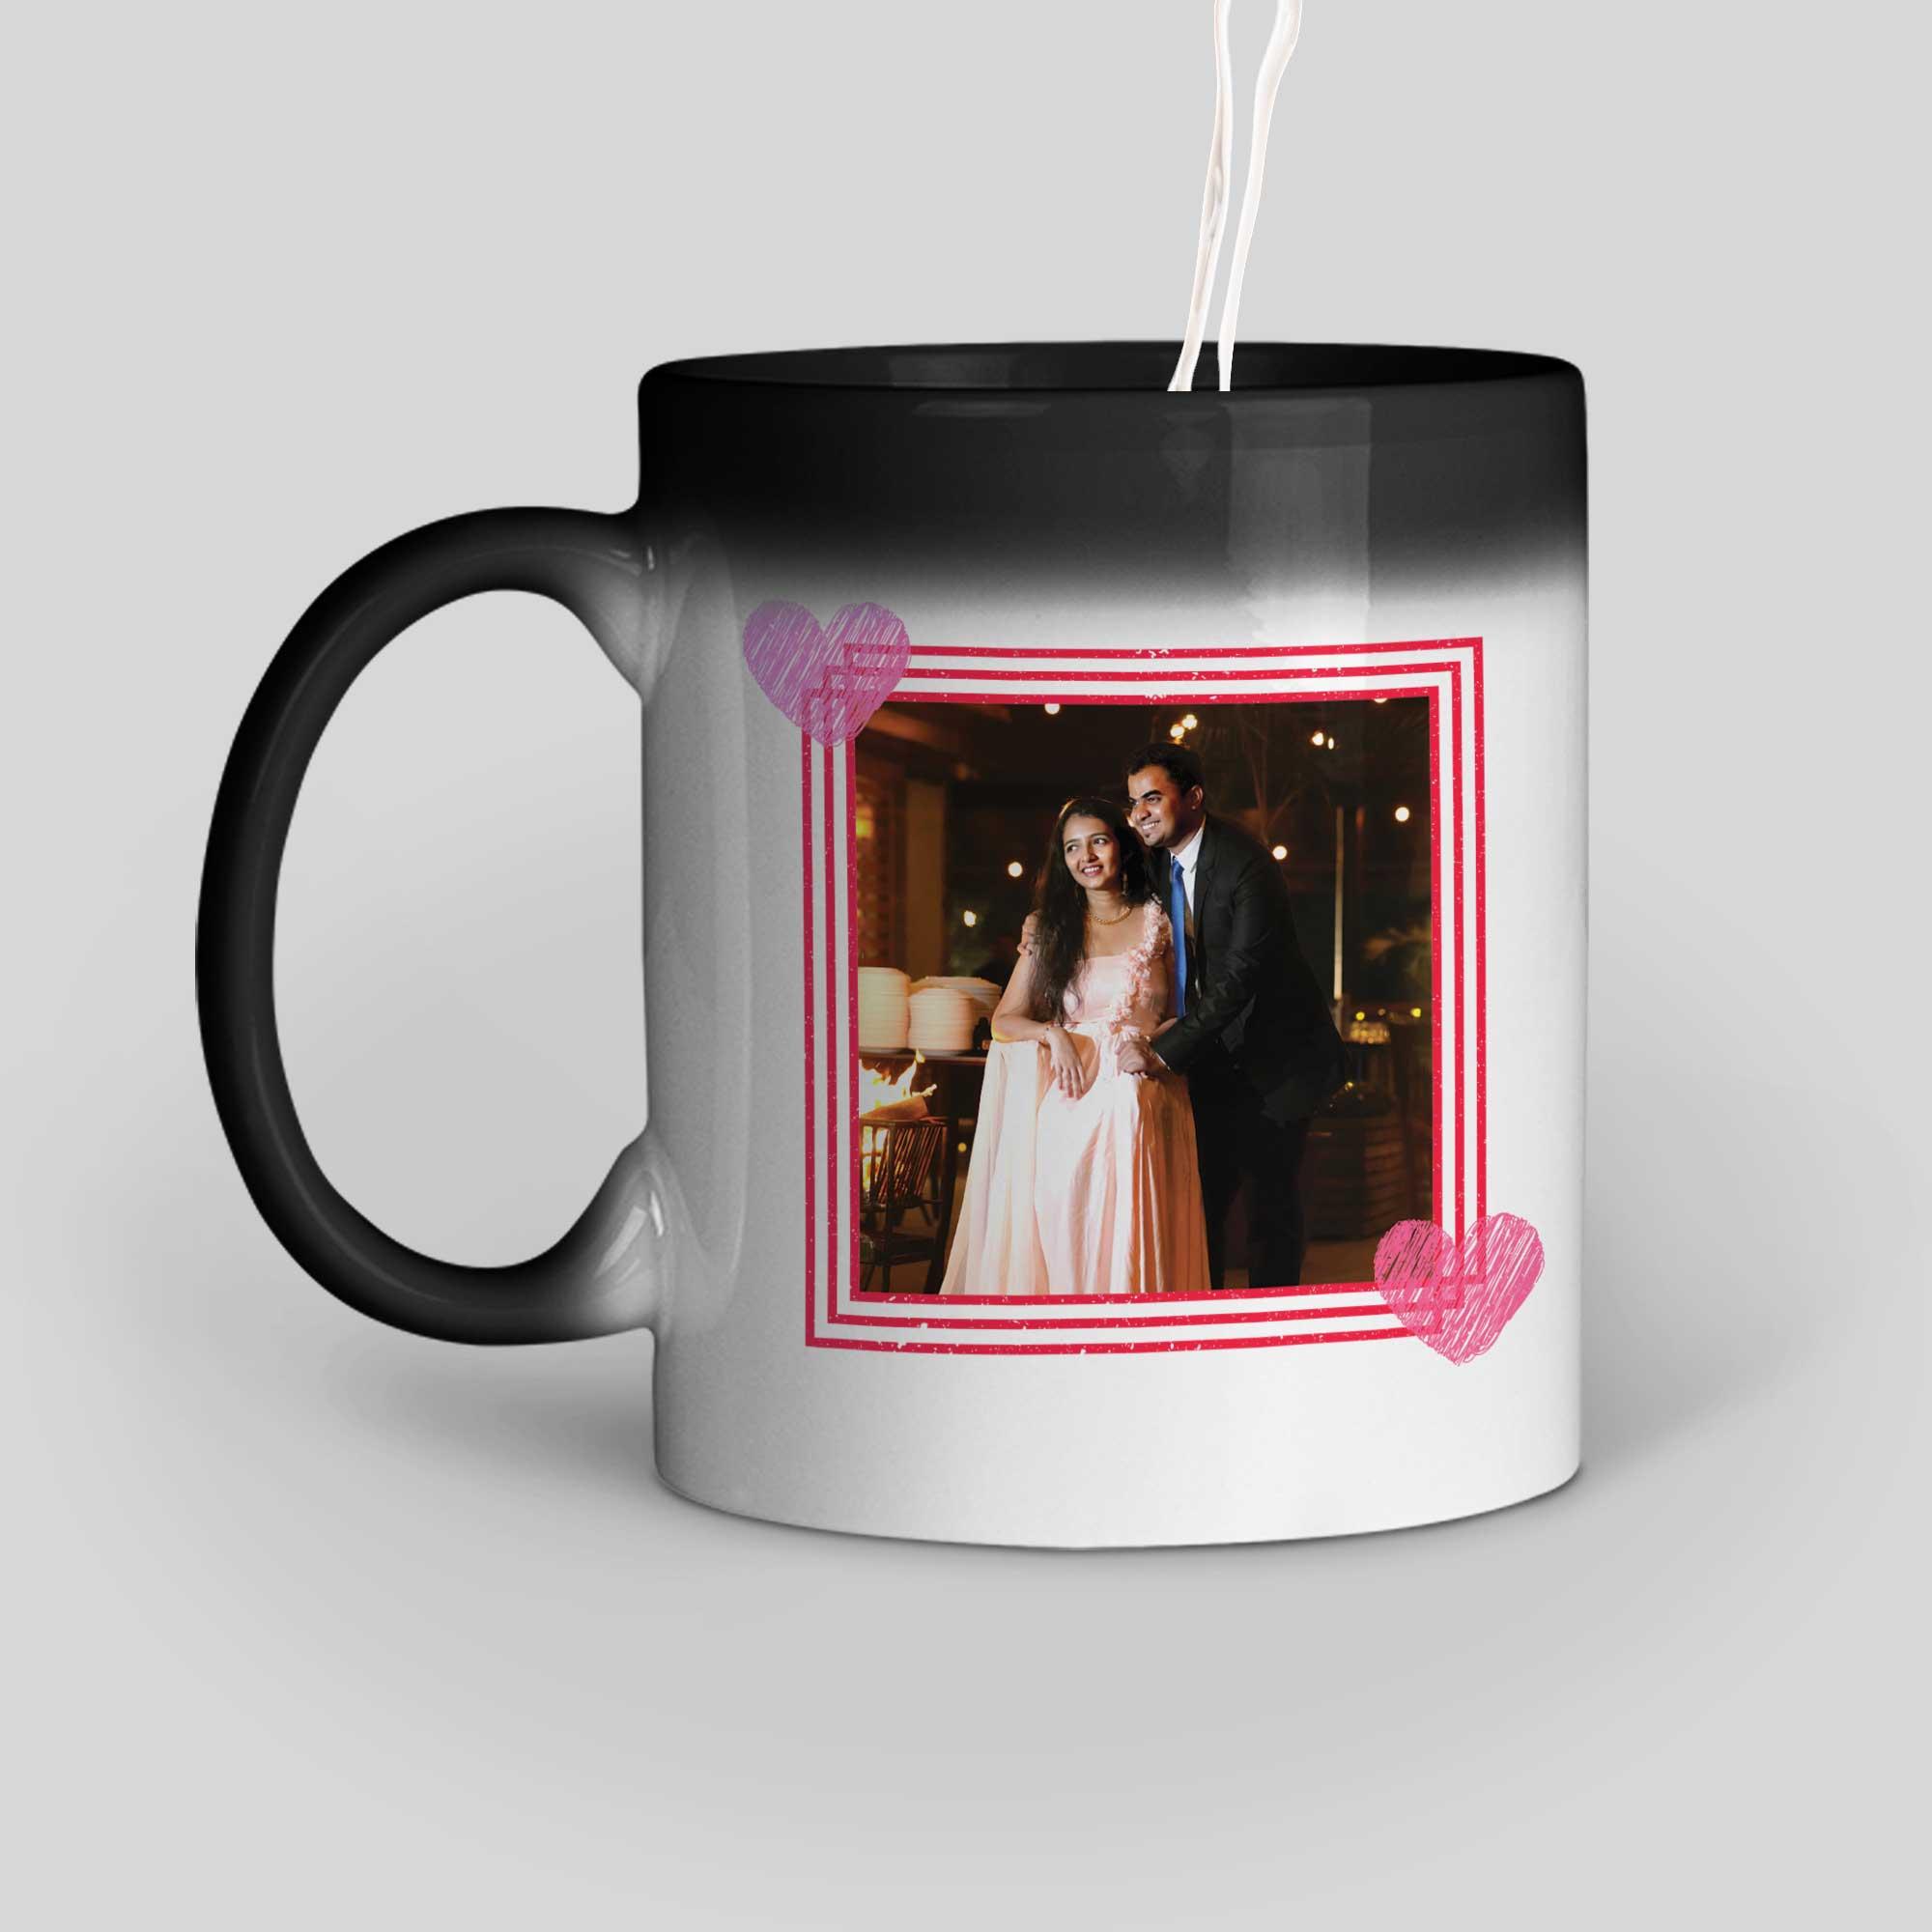 Happy Valentine's Day Personalized Magic Mug Left Side